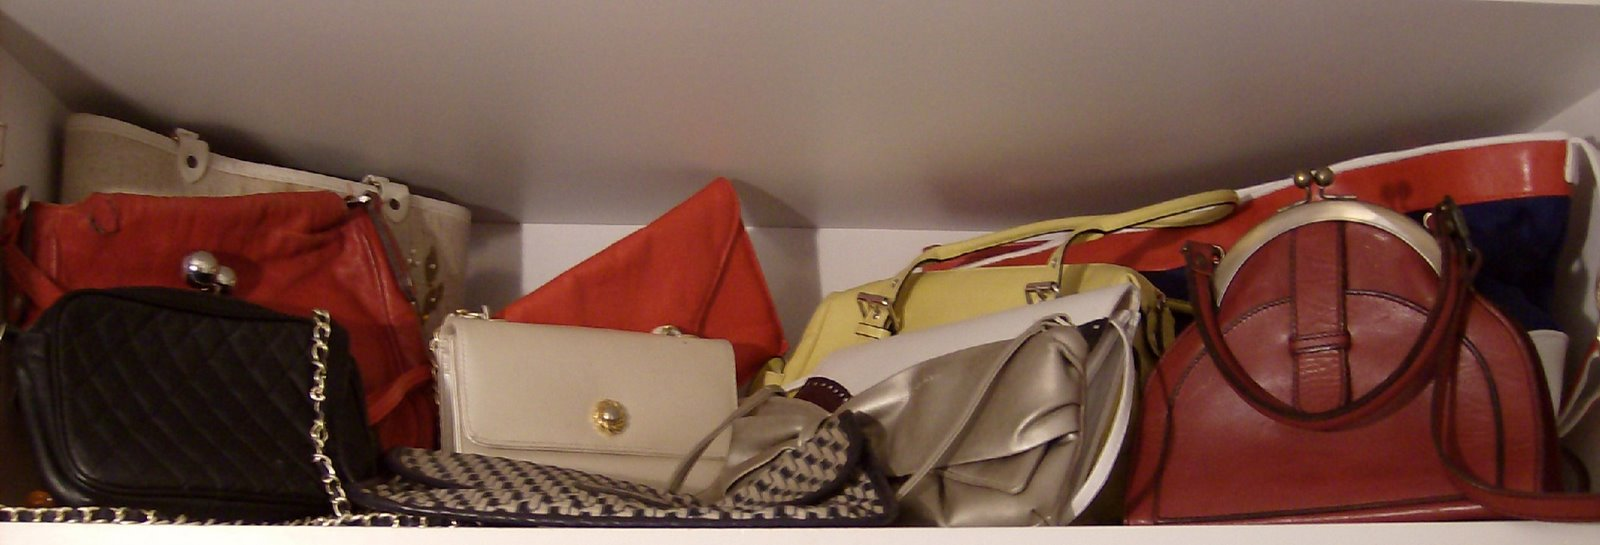 [bags1]